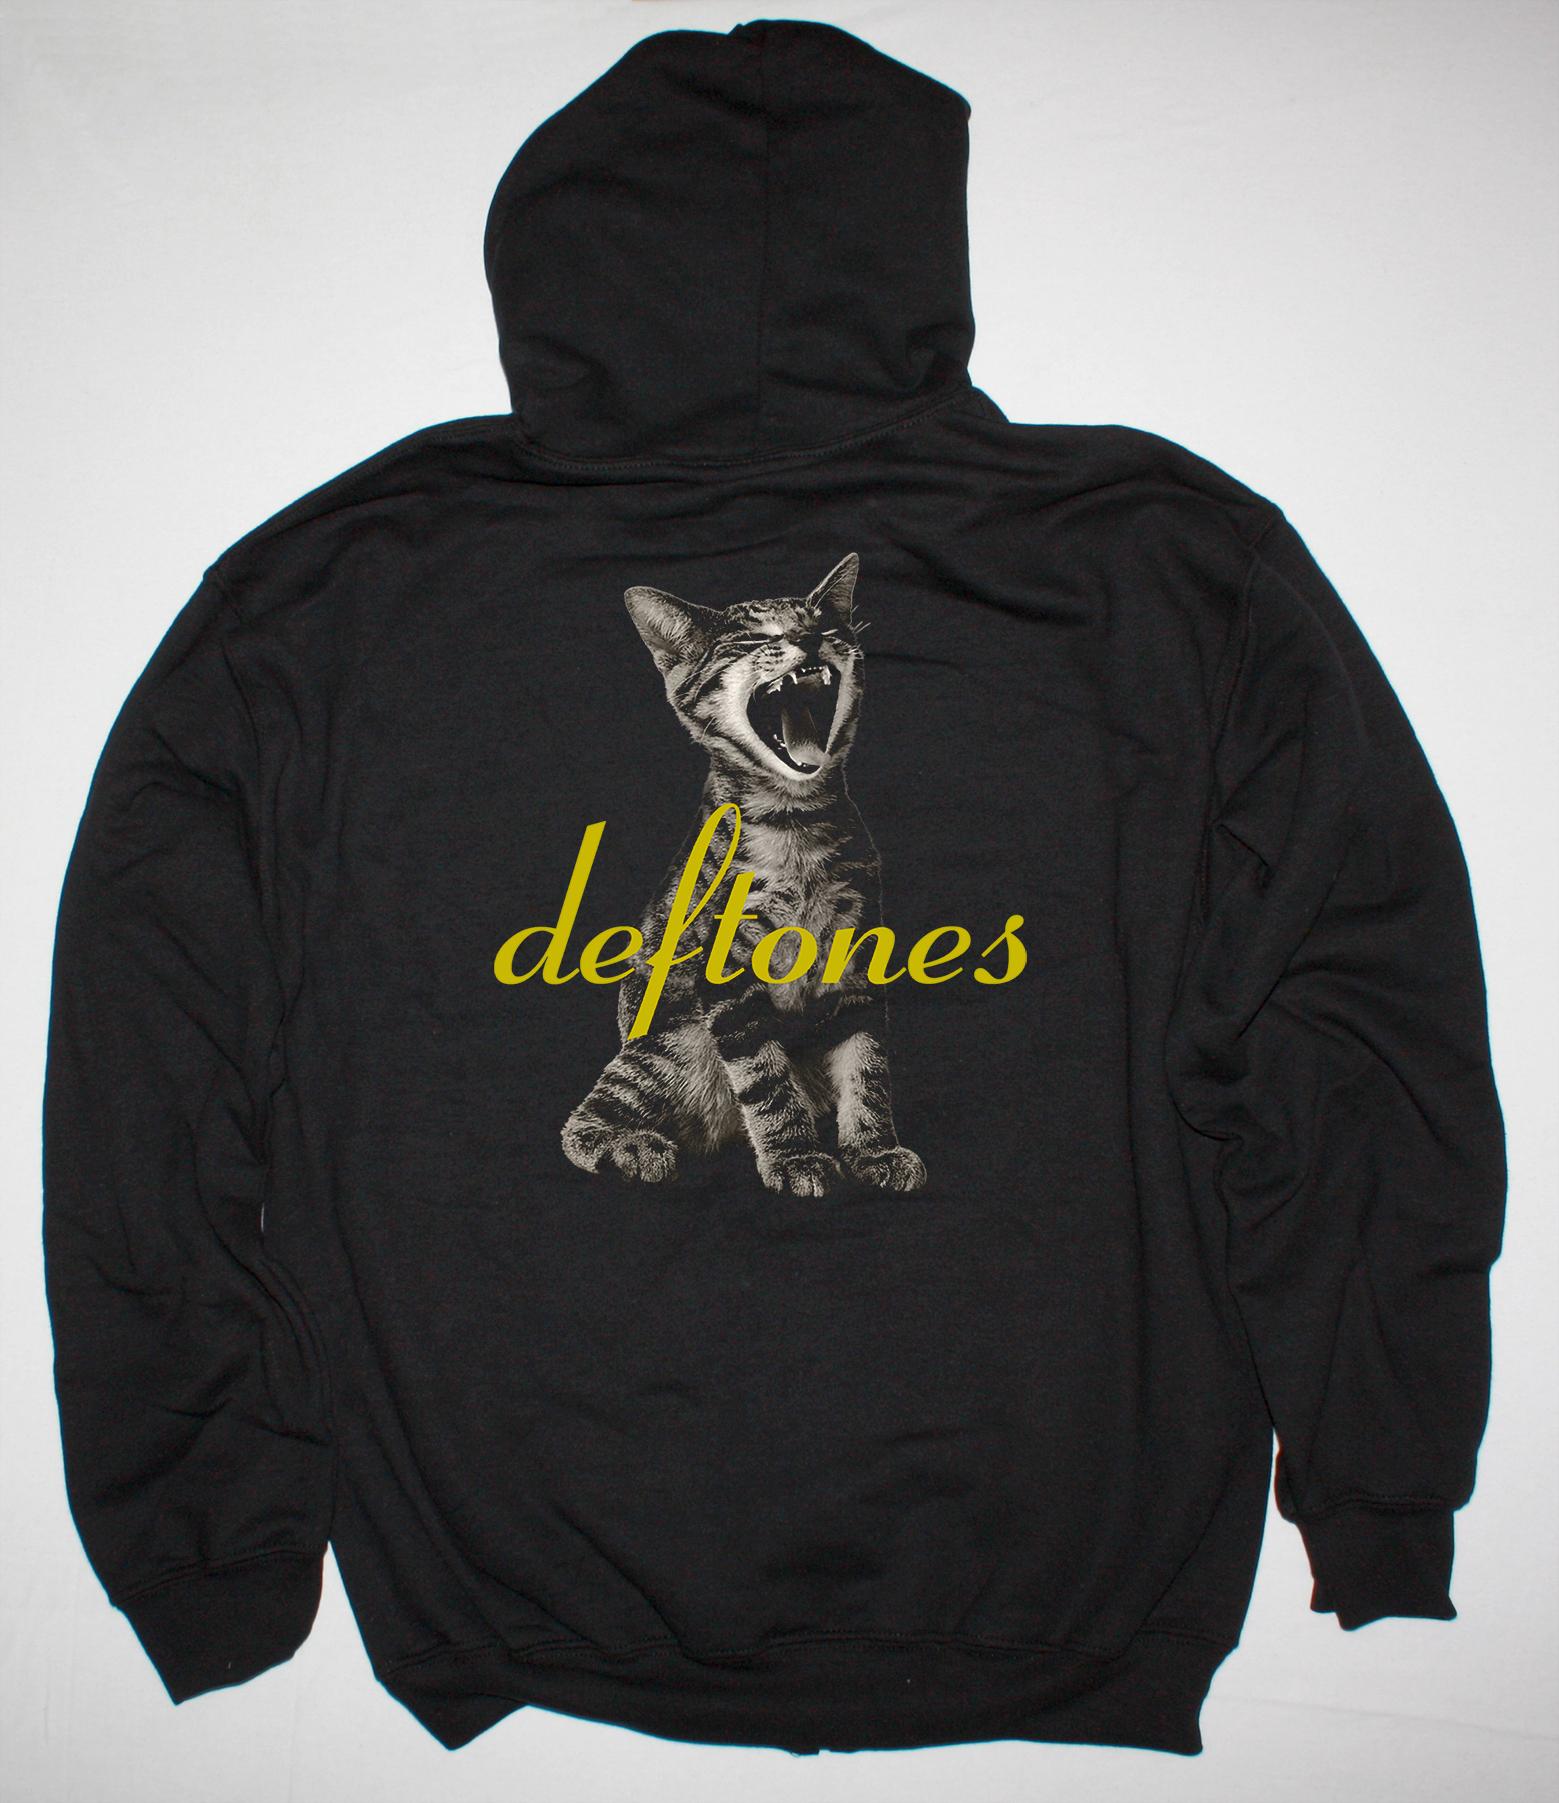 DEFTONES ADRENALINE NEW BLACK ZIPPED HOODIE